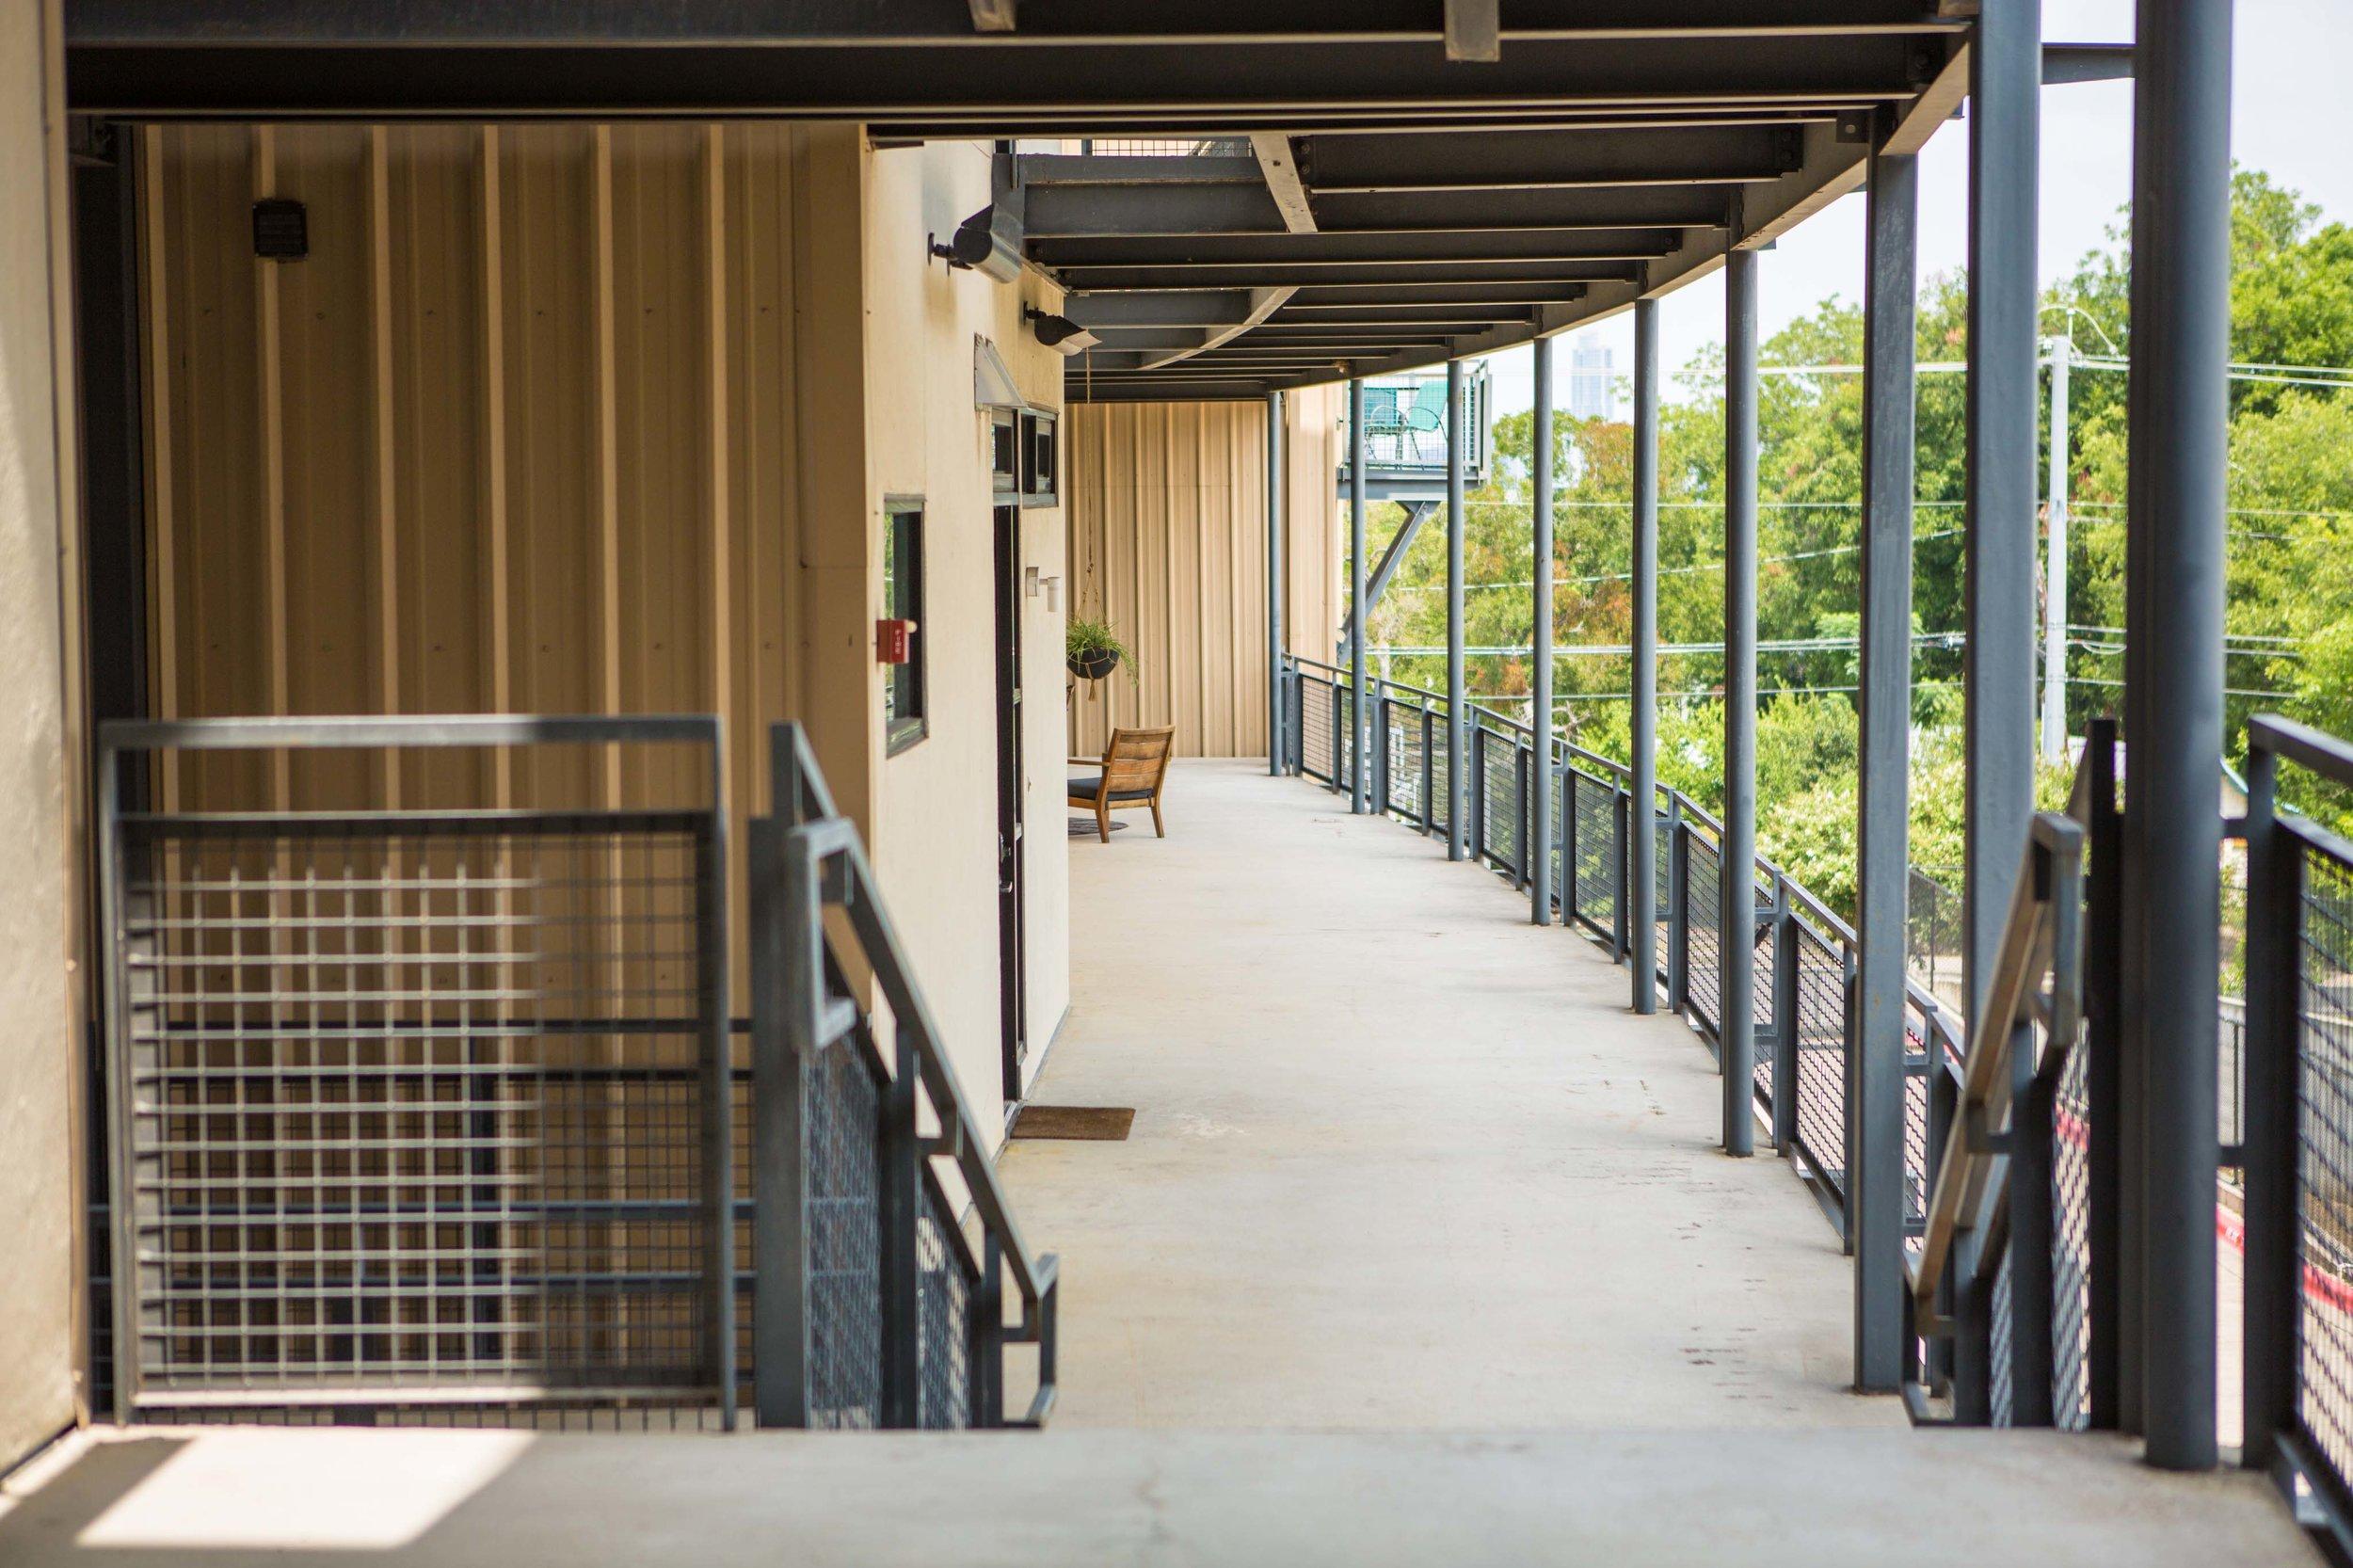 2525SLamar-WEB_62 -front porch.jpg